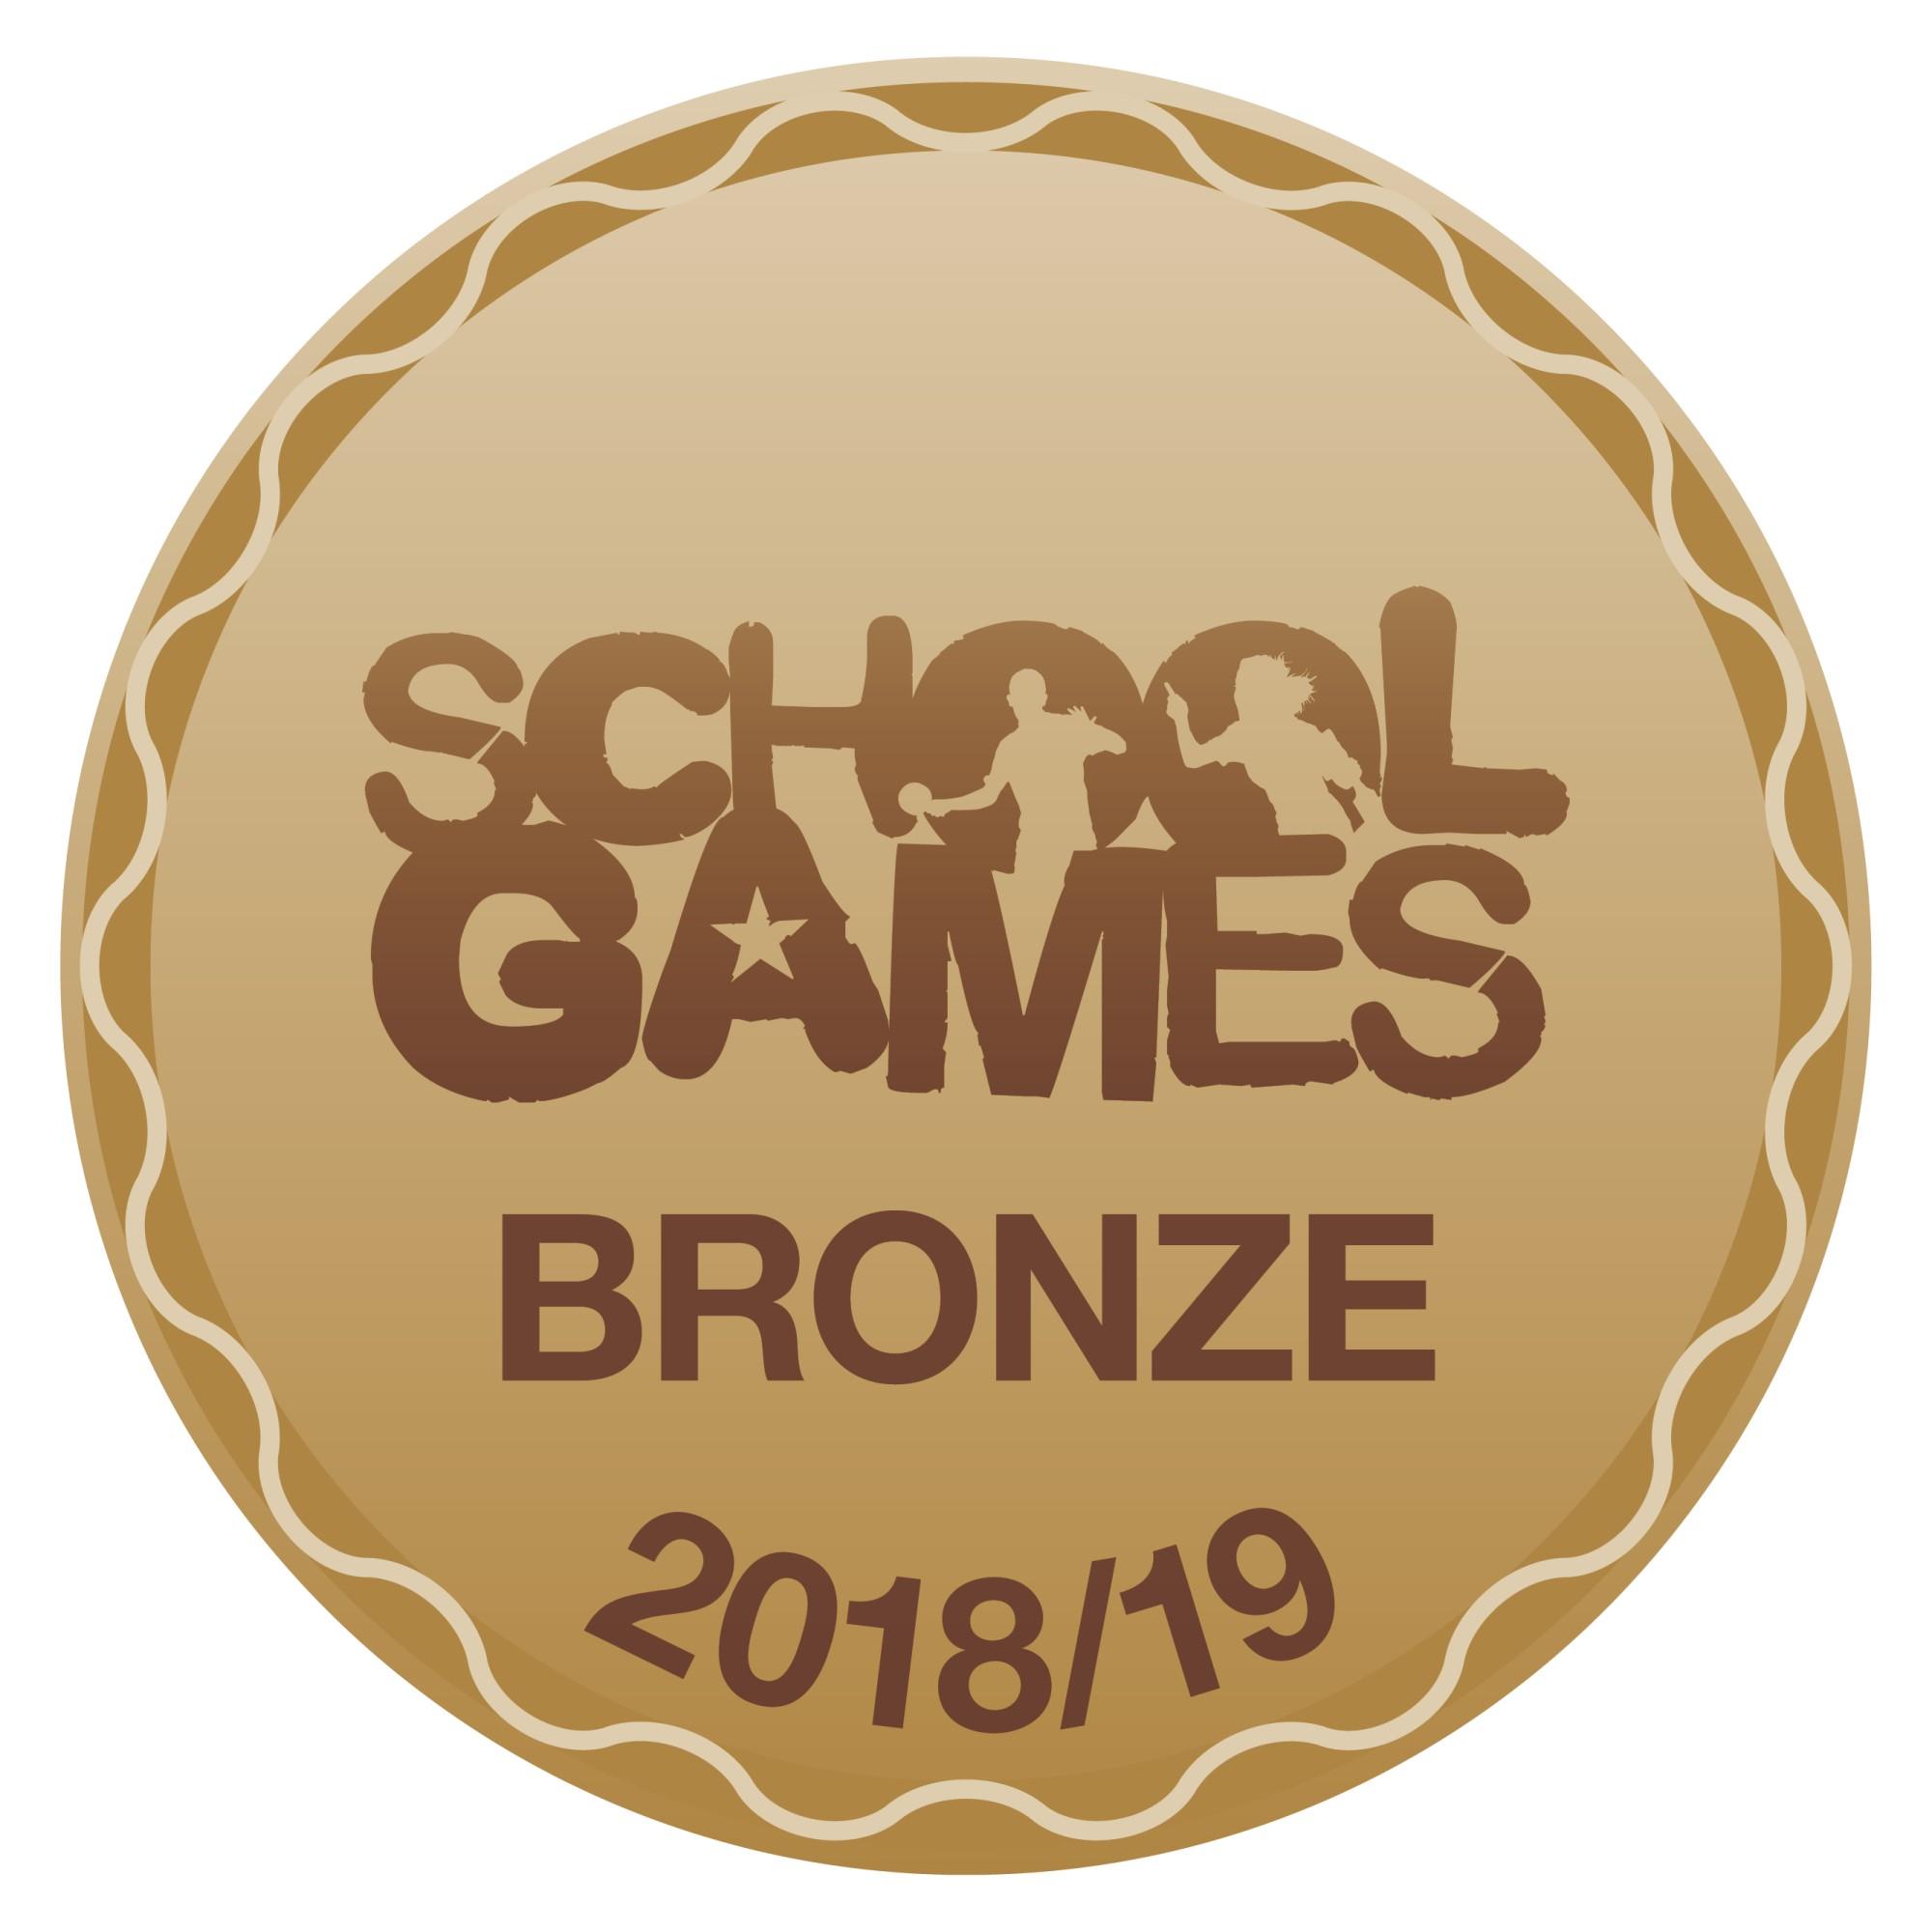 SG L1 3 mark bronze 2018 19